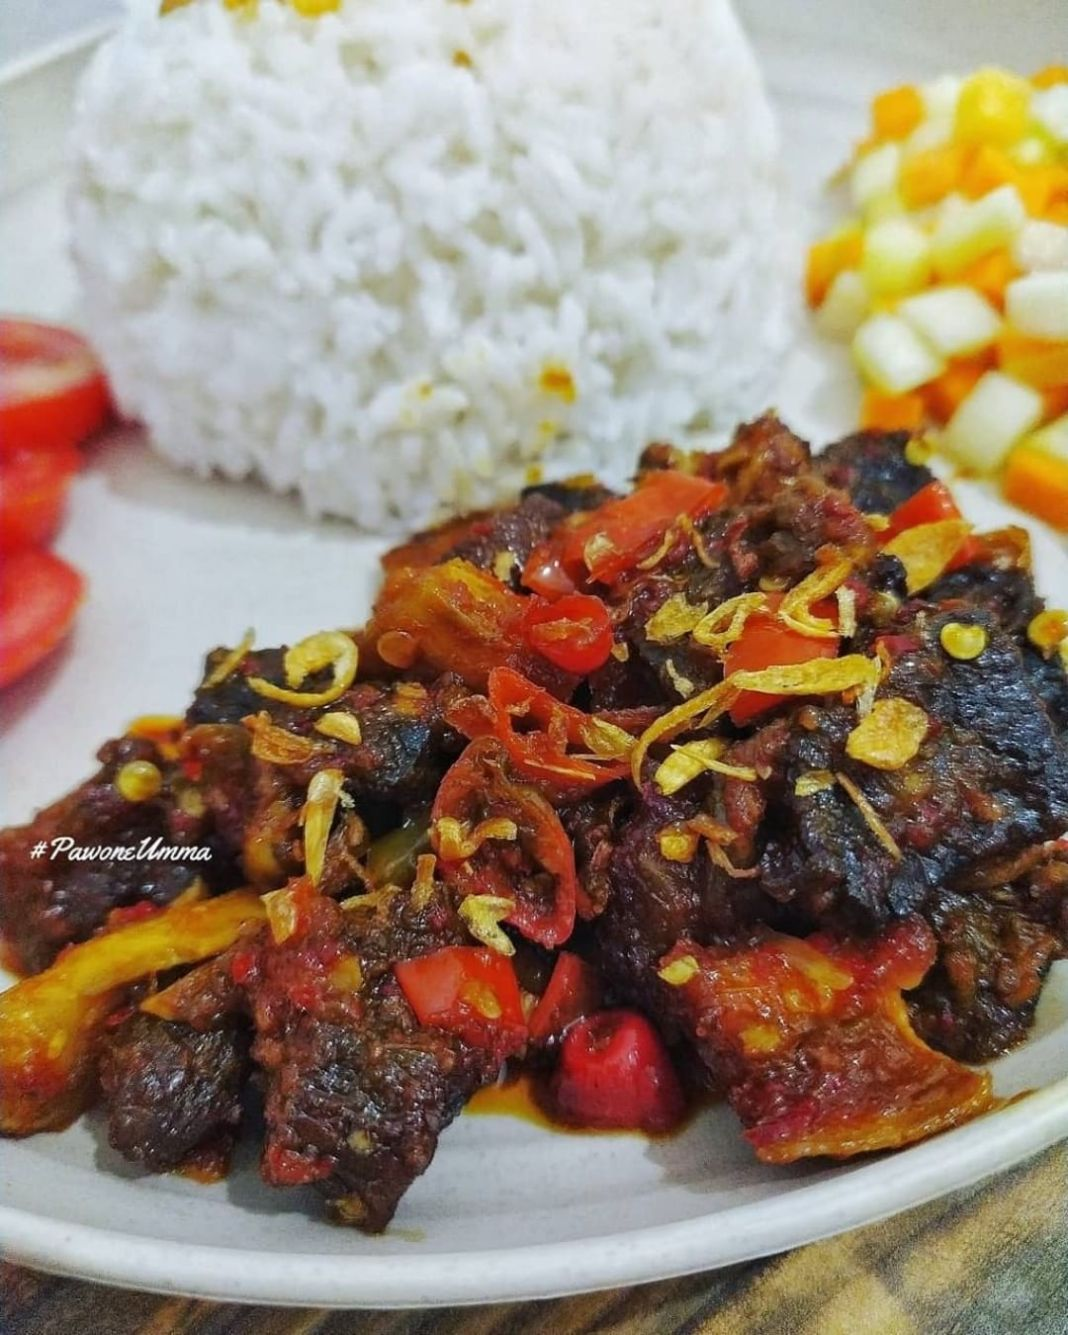 Info kuliner, Daging Gongso Pedas Mantap  Bahan: ½ kilo daging sapi (rebus hingga empuk, lalu goreng ½ kering…